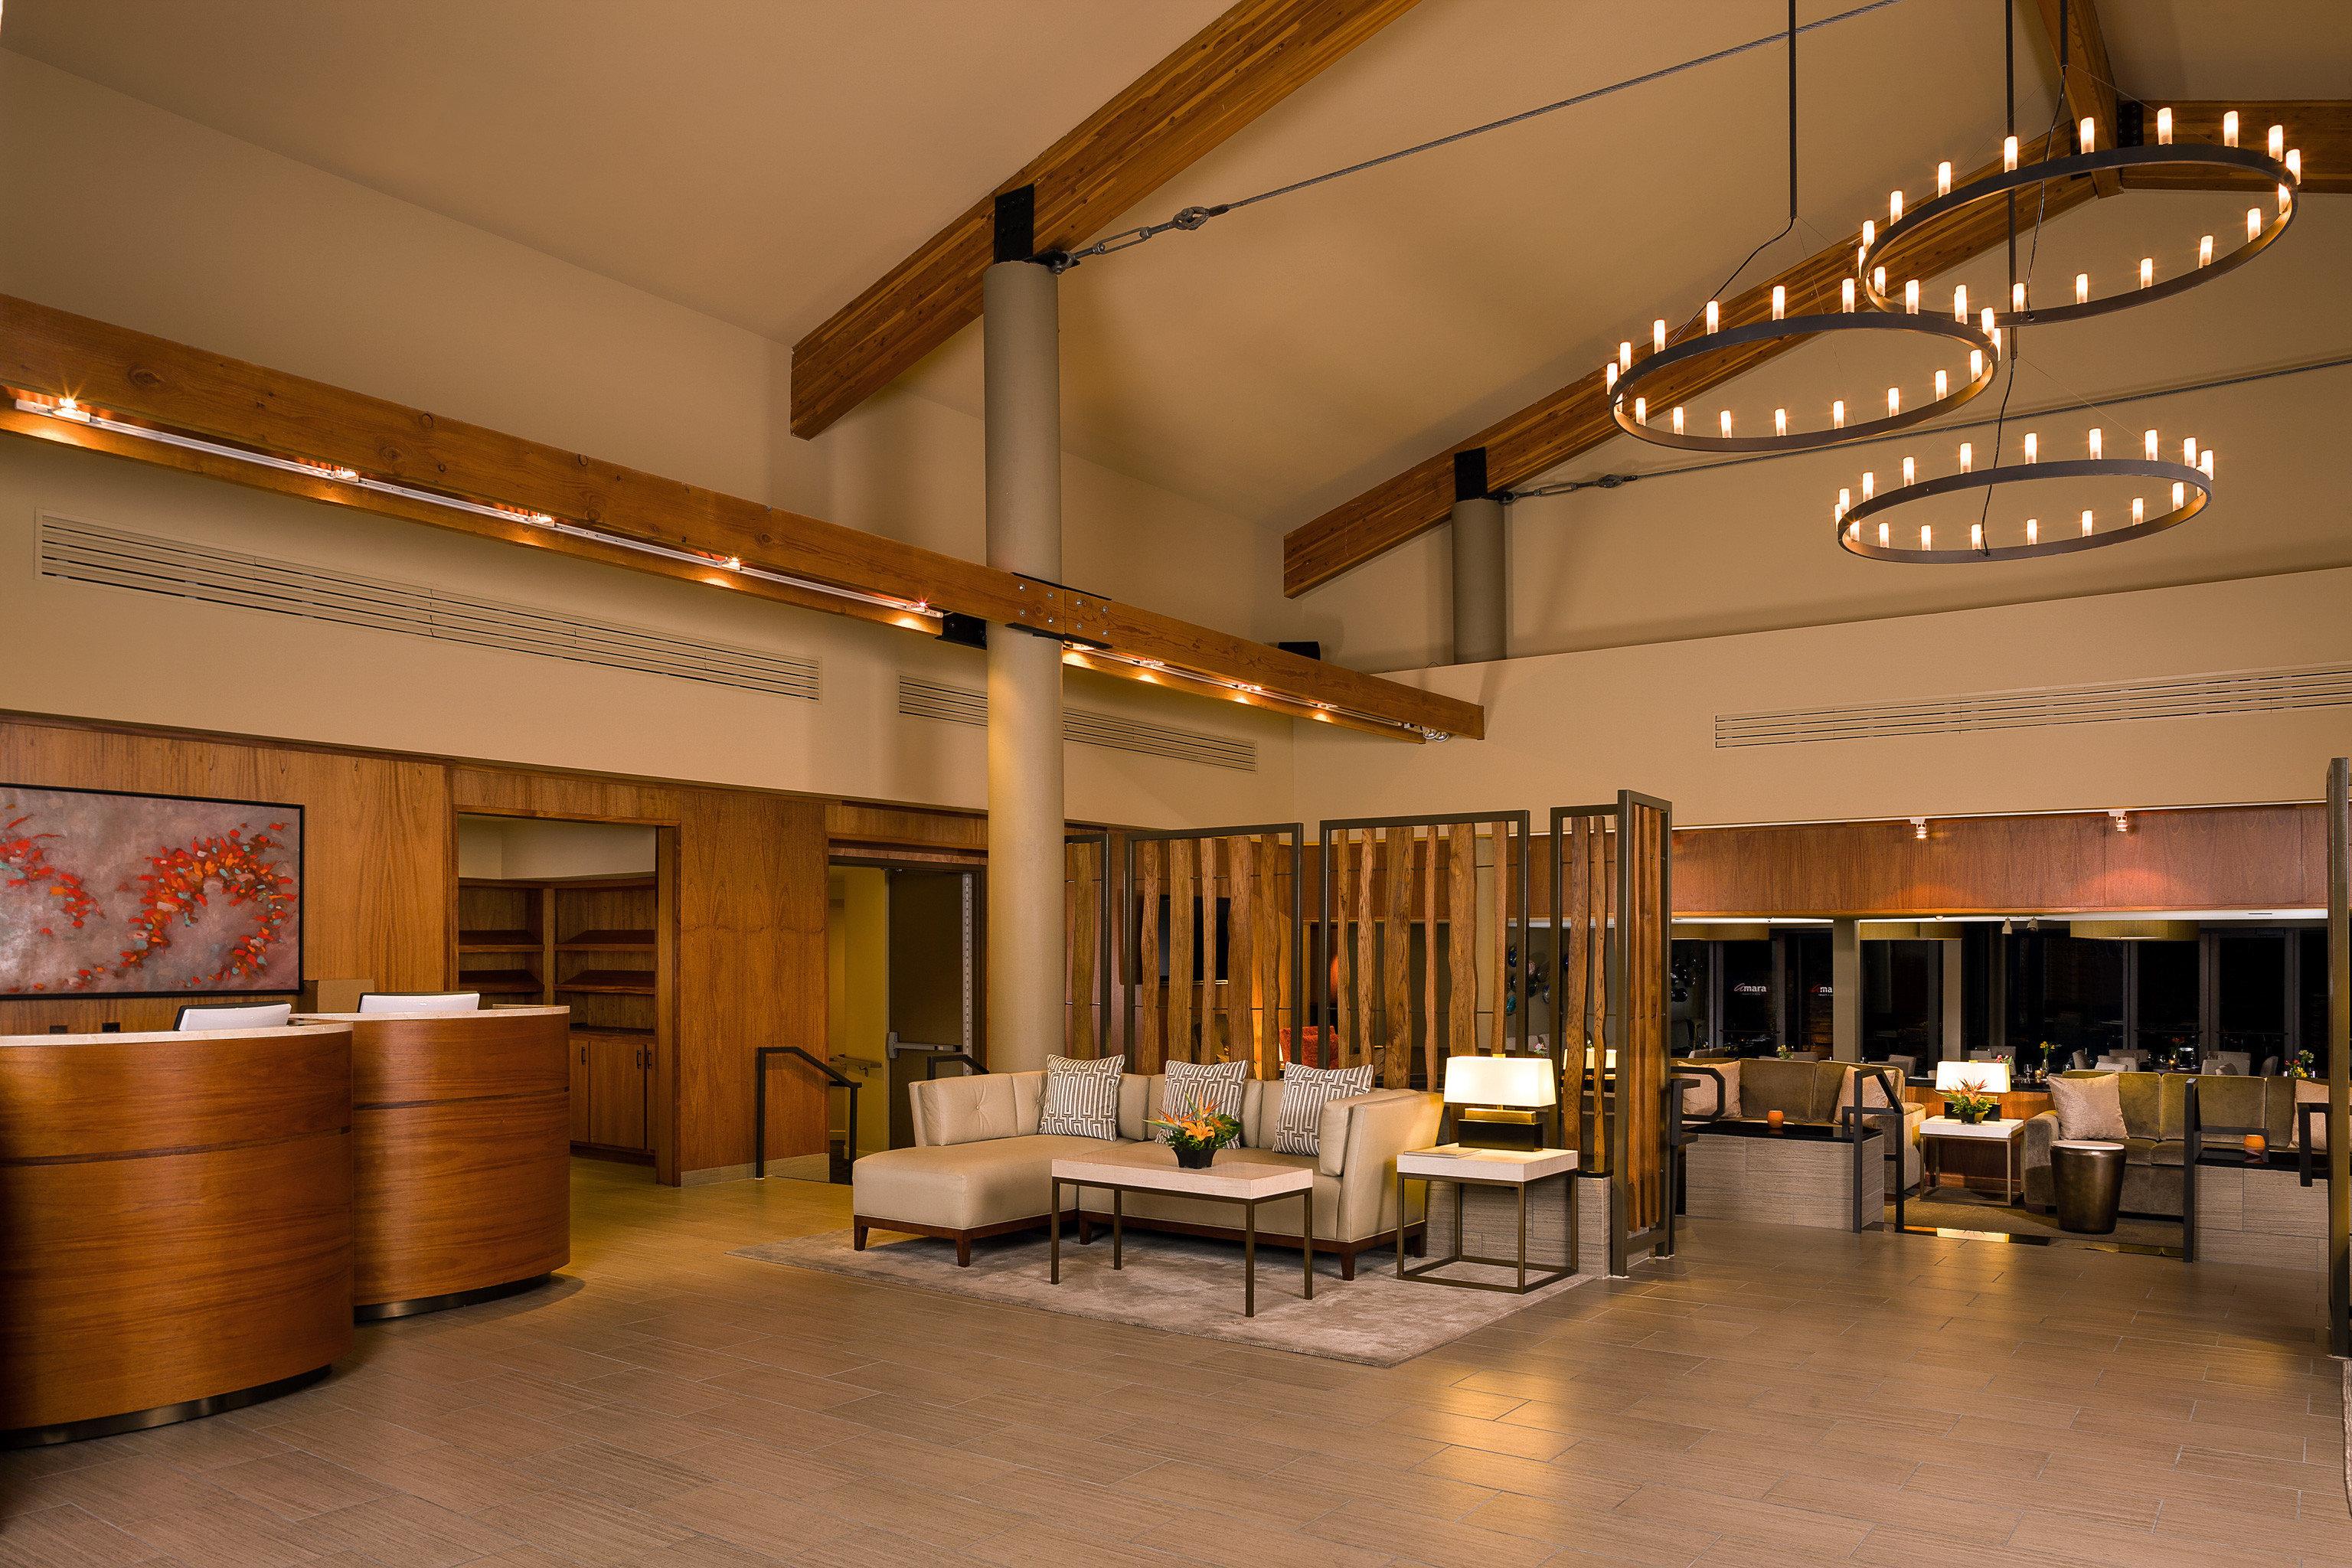 Boutique Lobby Modern building Architecture lighting convention center restaurant